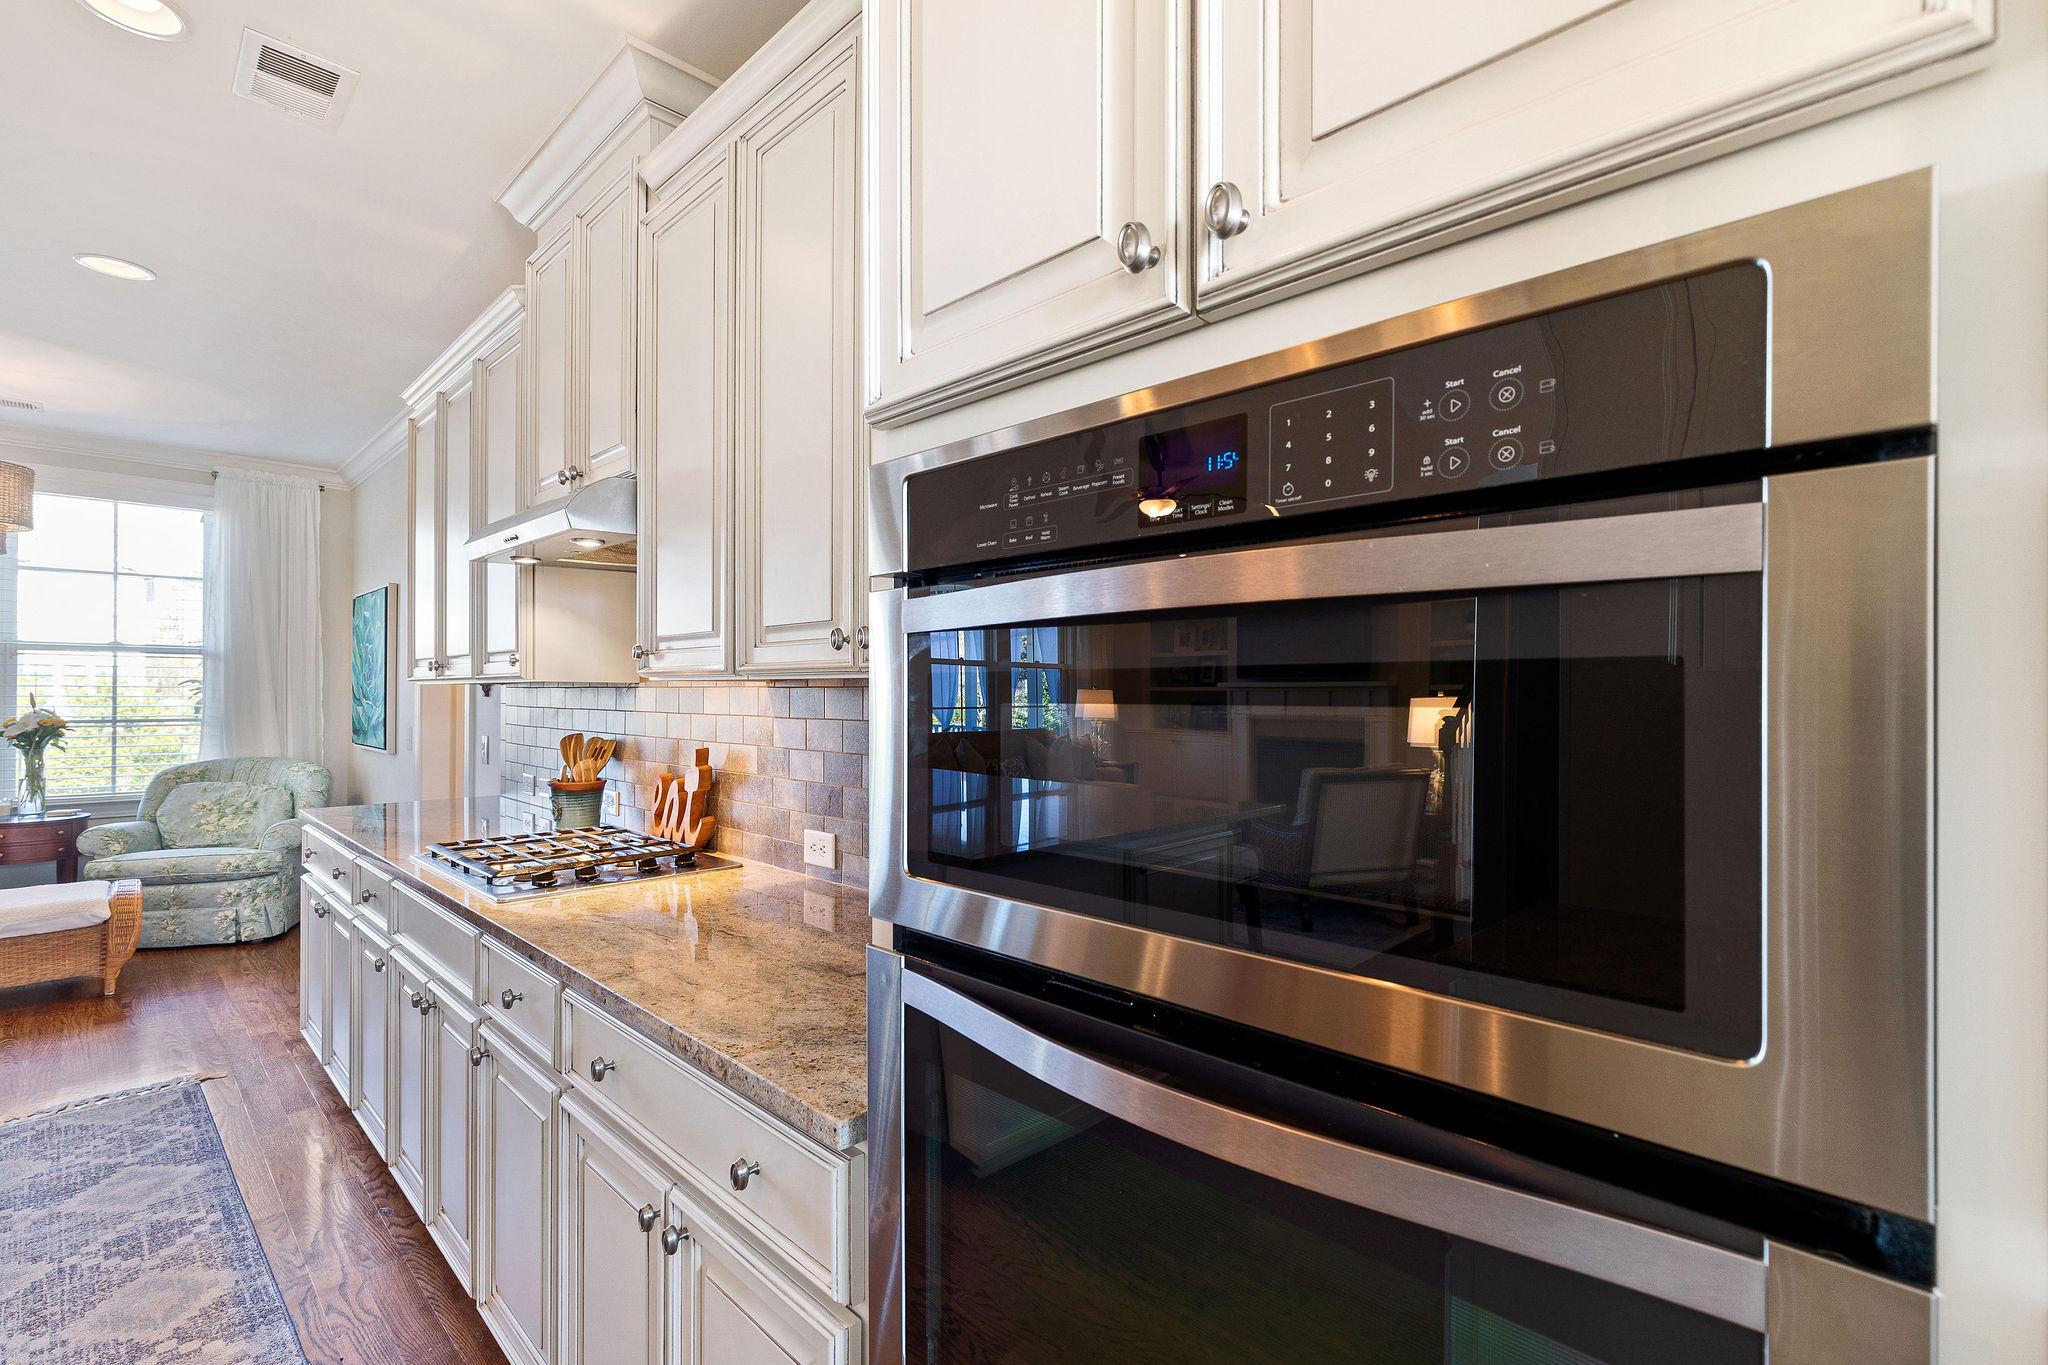 Dunes West Homes For Sale - 3212 Hatchway, Mount Pleasant, SC - 28